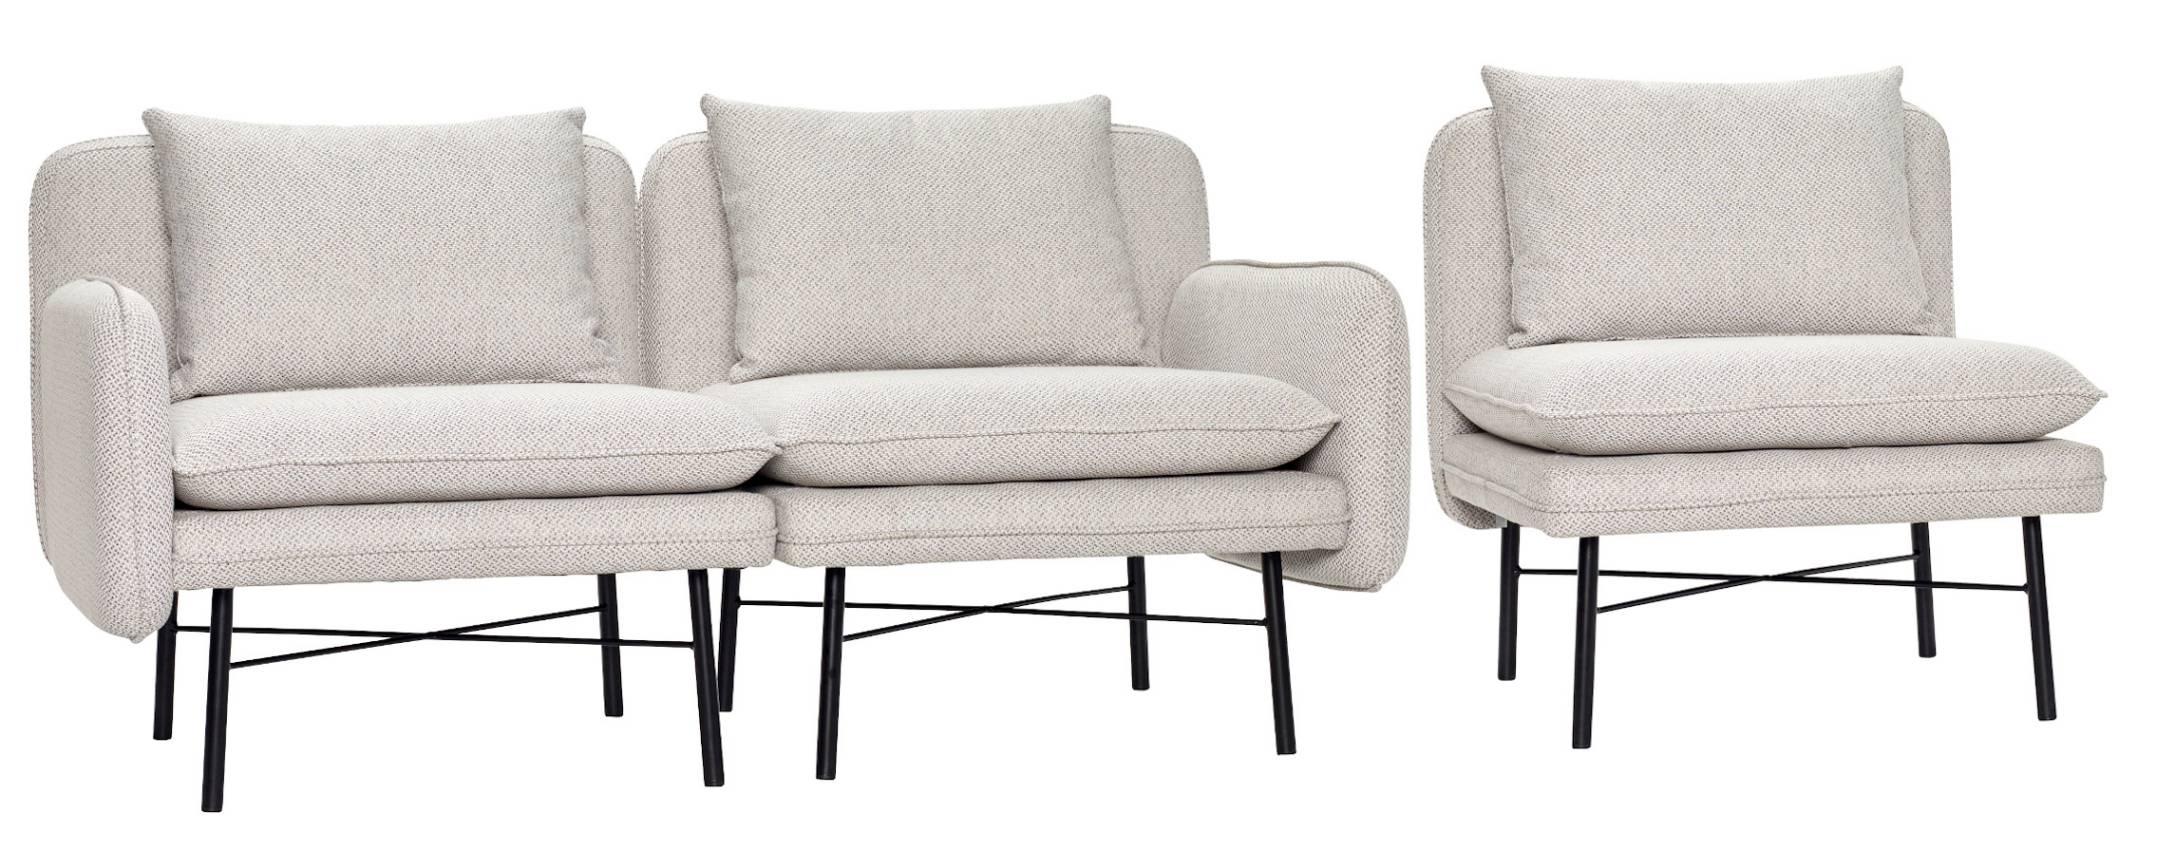 Hellgrau Sofa 3-Sitzer